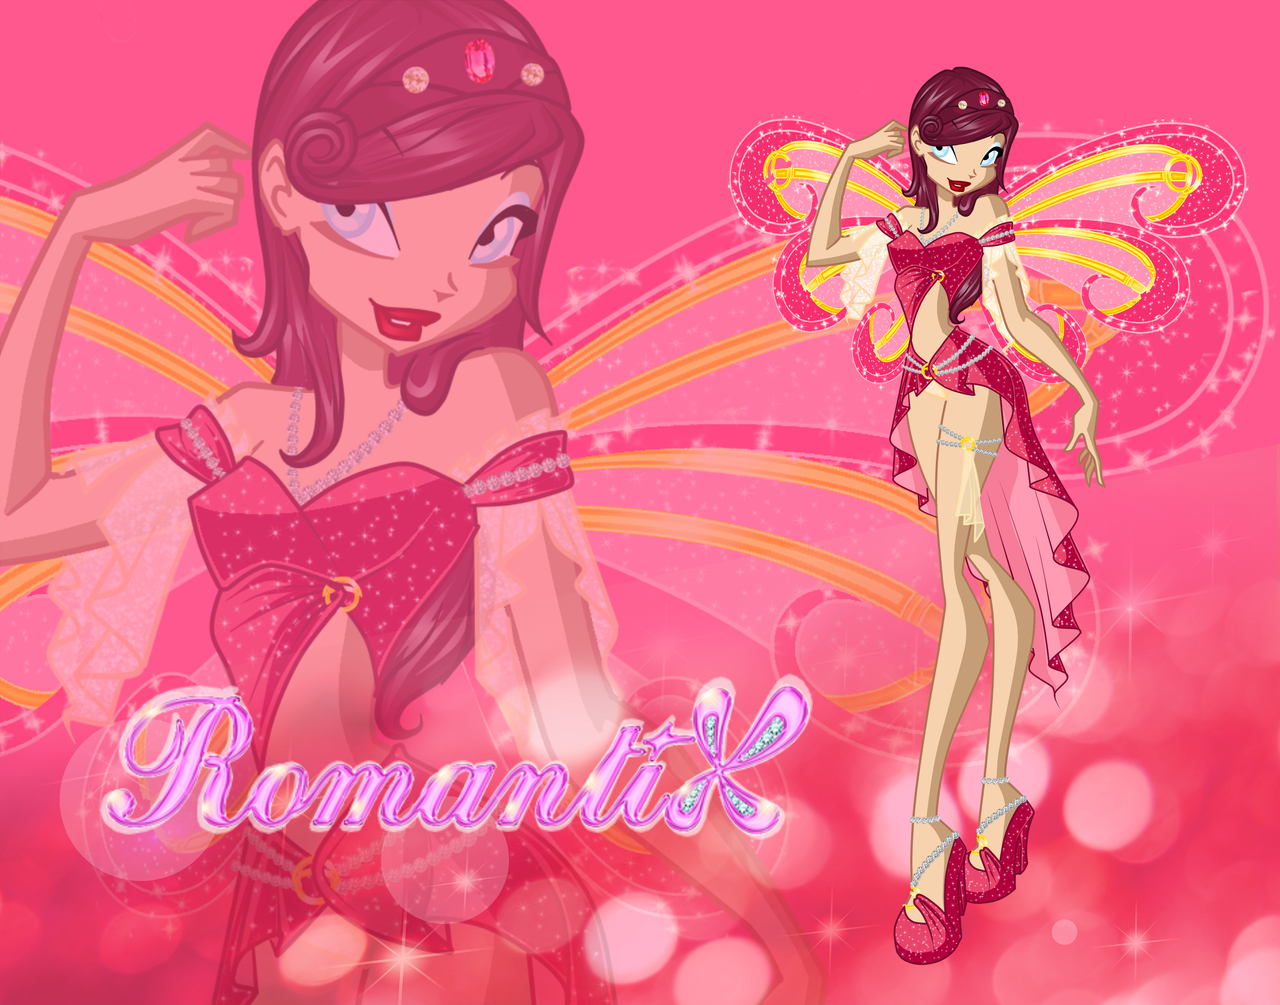 Cherry RomantiX by Cristalinawinx on DeviantArt